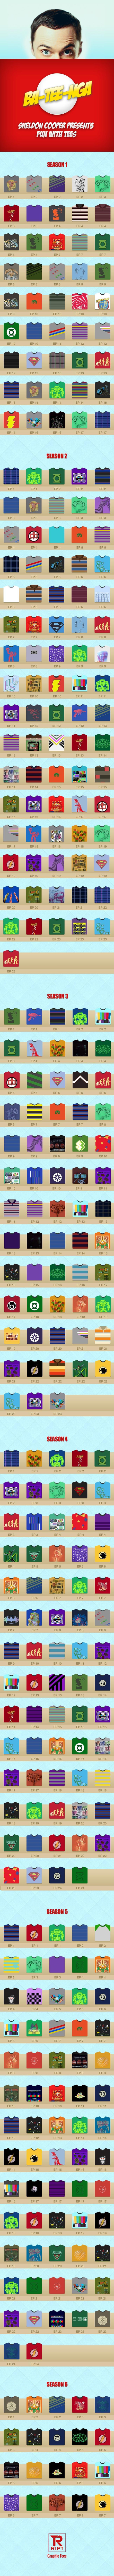 Les TeeShirts de Sheldon (The Big Bang Theory) #2